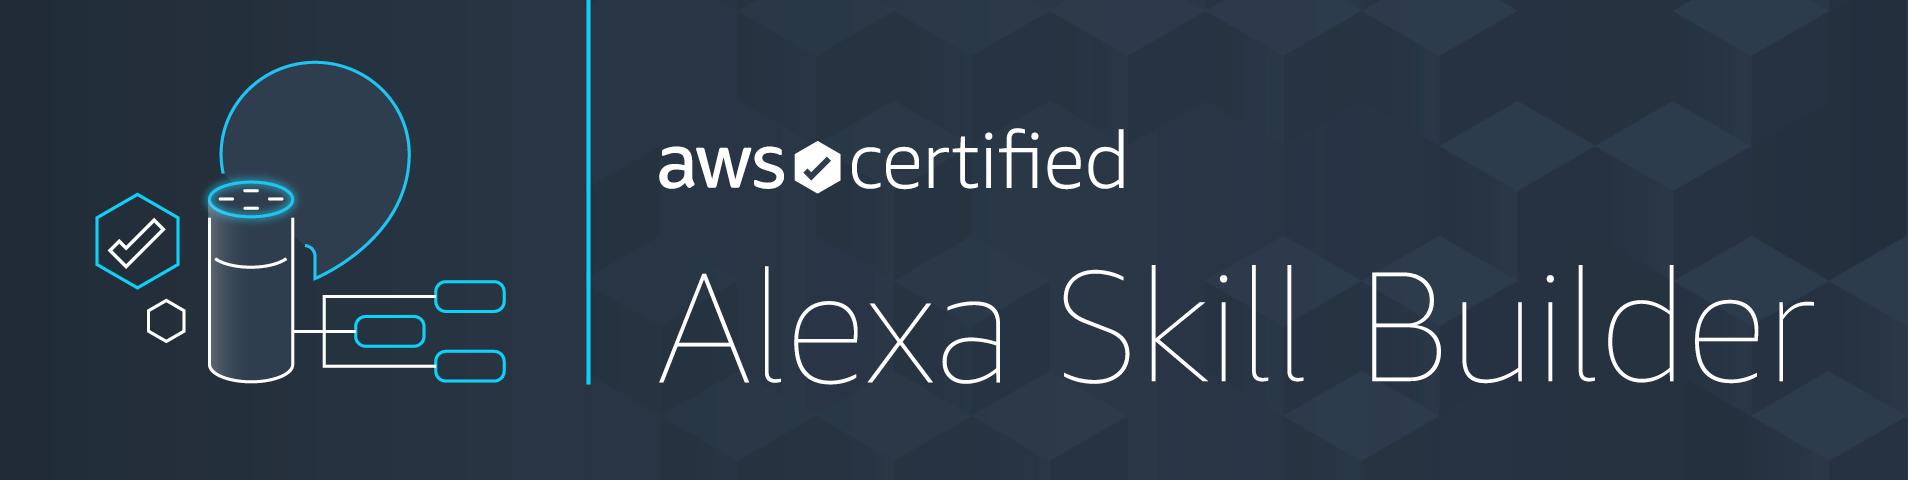 I'm AWS Certified!